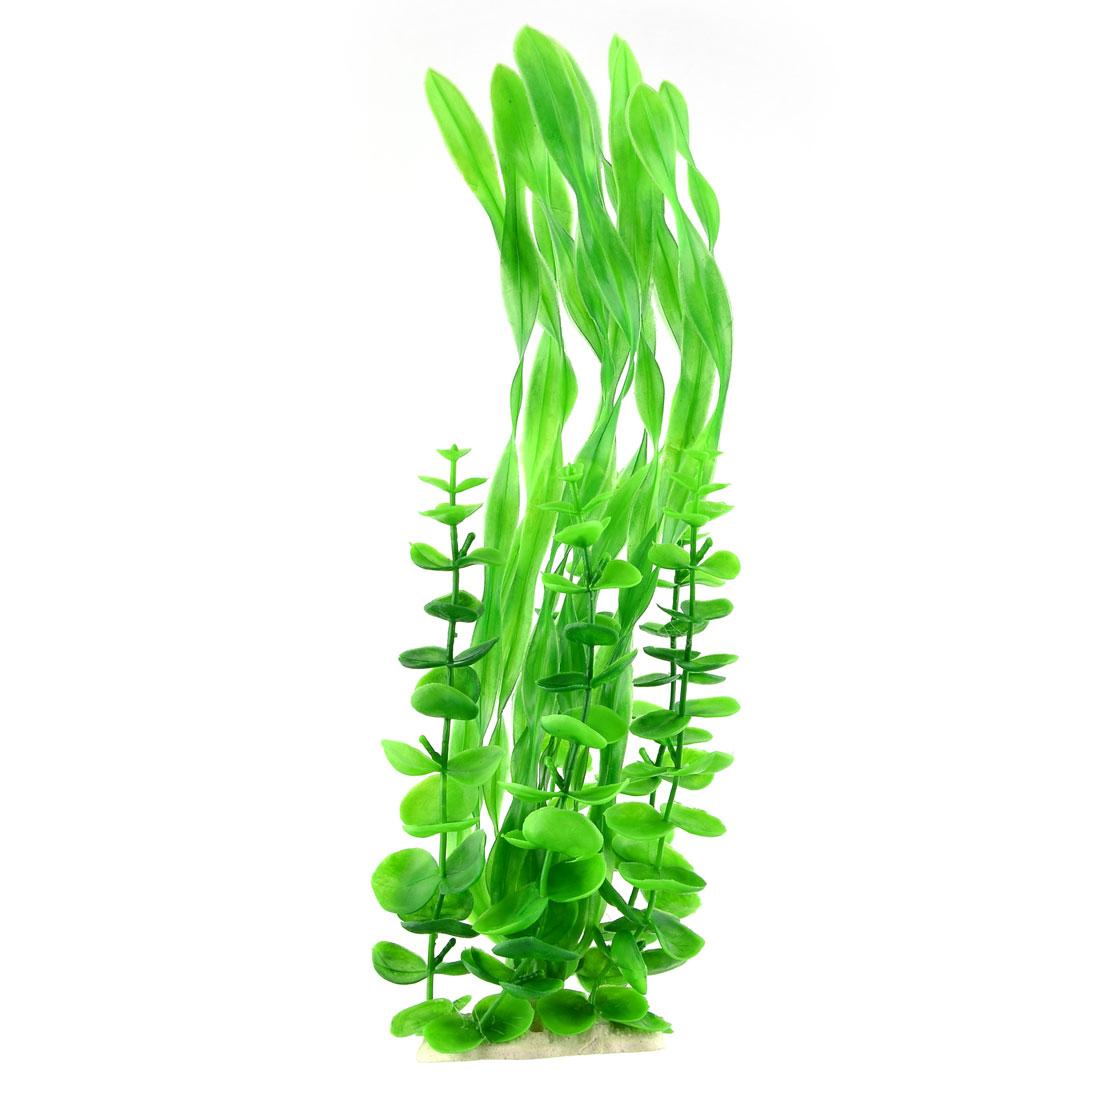 Fish Tank Aquarium Stone Base Realistic Artificial Plant Ornament Decoration Green